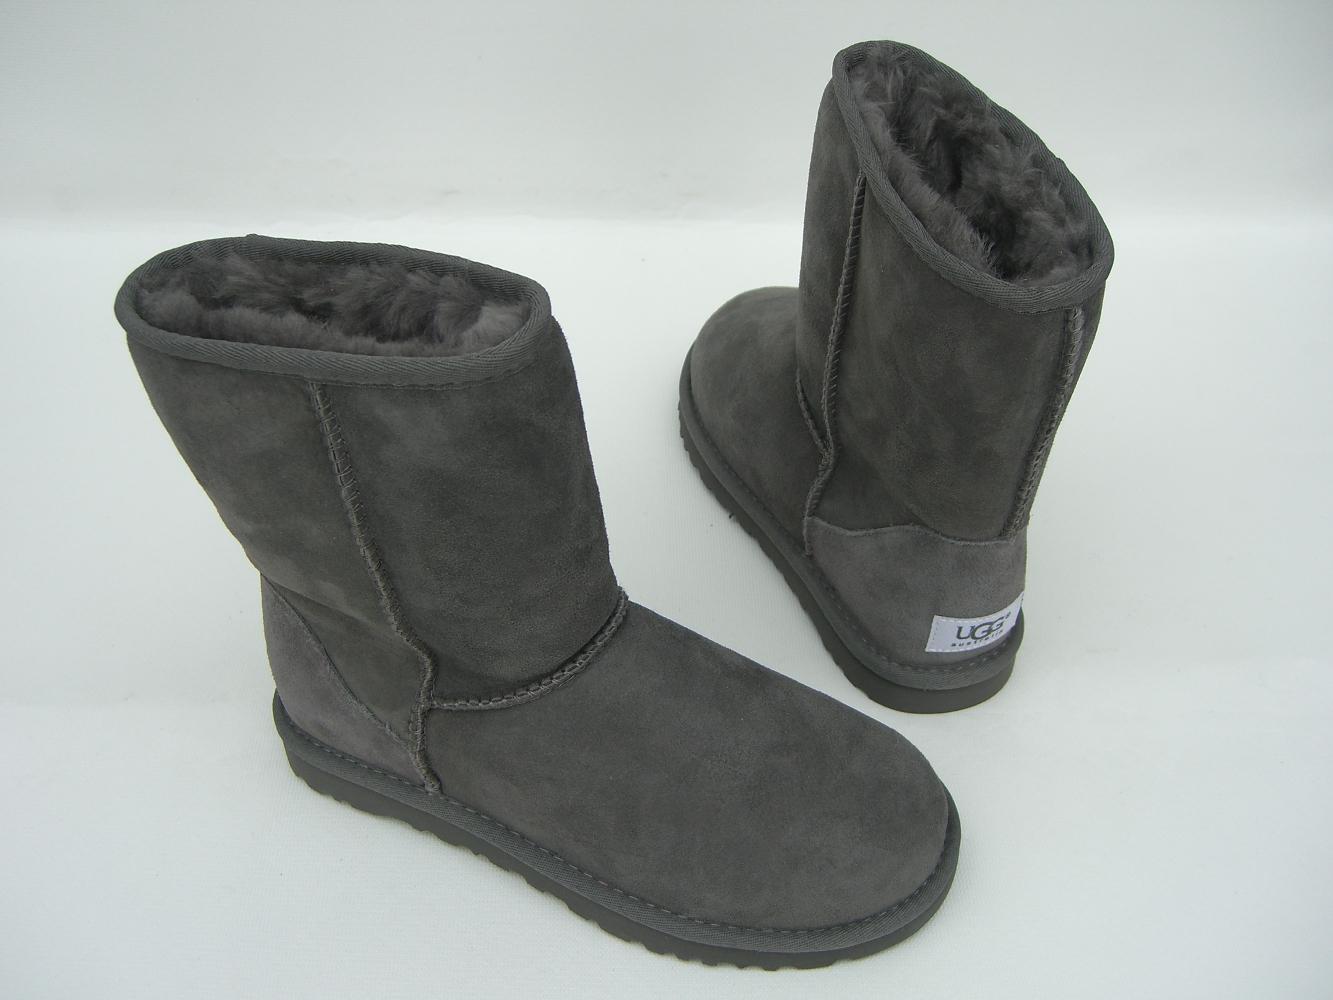 ugg australia stiefel boots classic damen women short original ebay. Black Bedroom Furniture Sets. Home Design Ideas